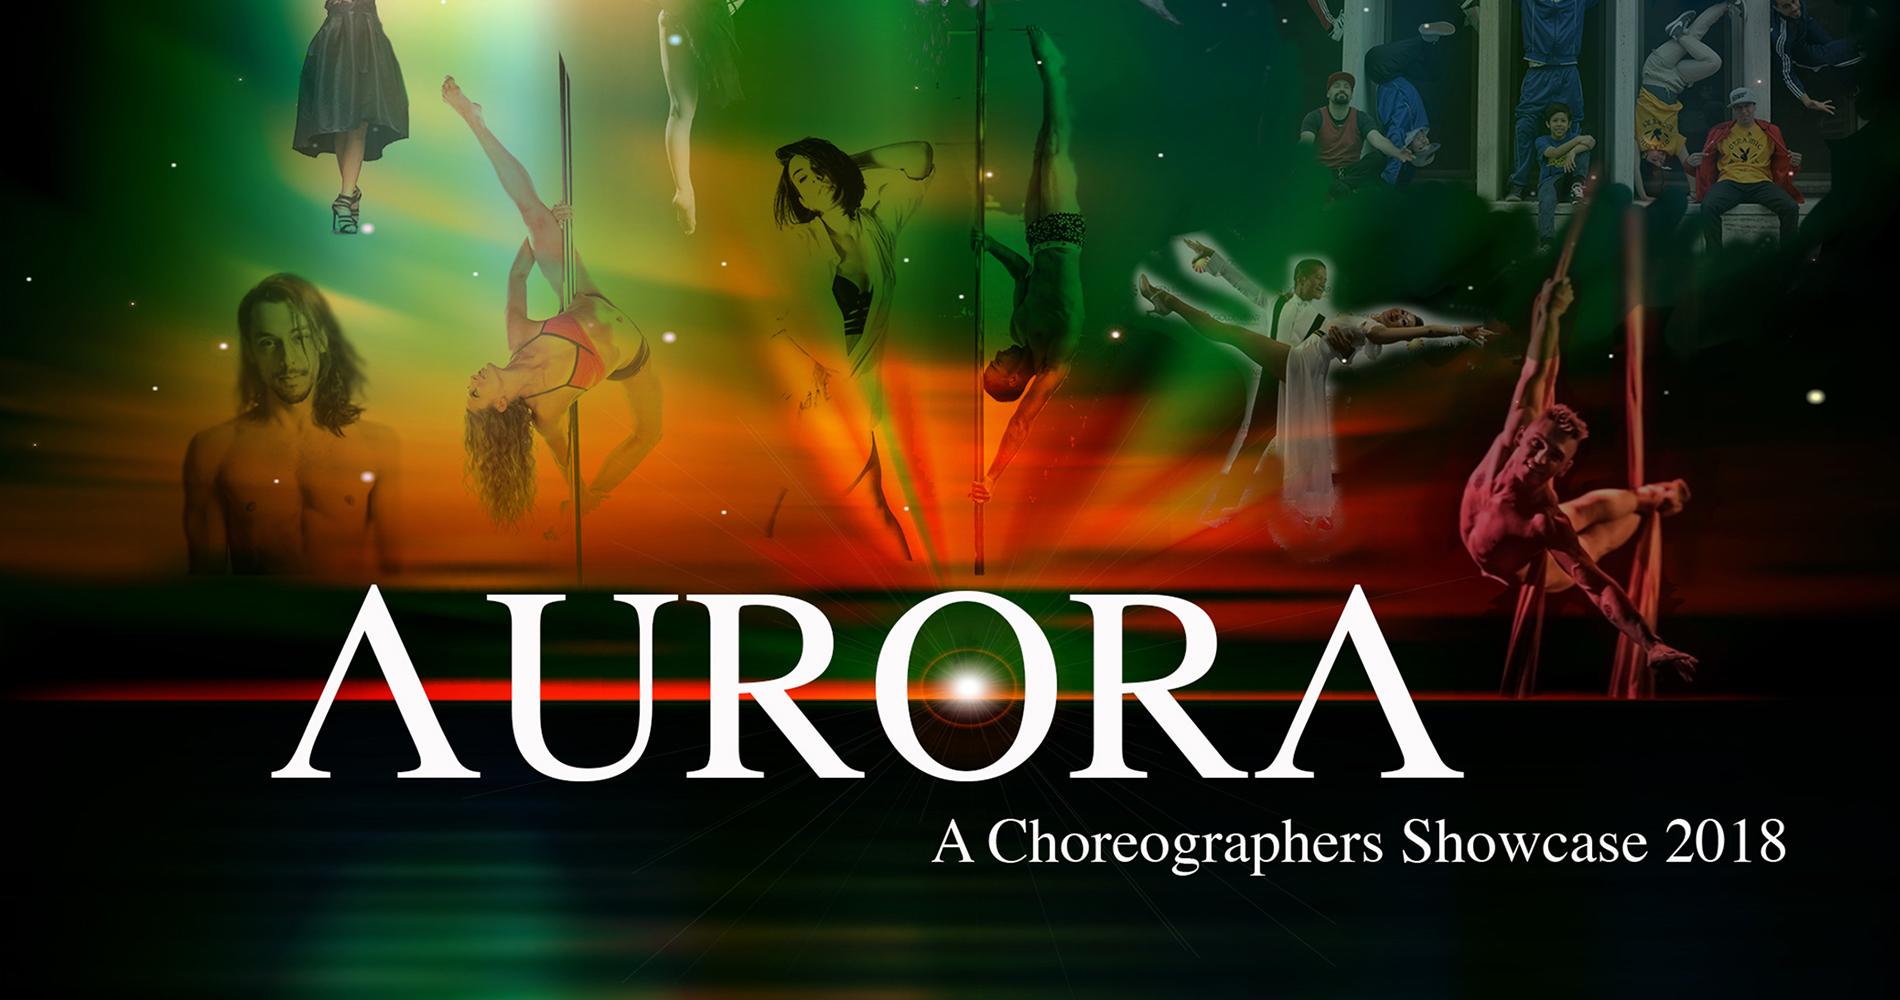 AURORA: A Choreographer's Showcase at Body & Pole